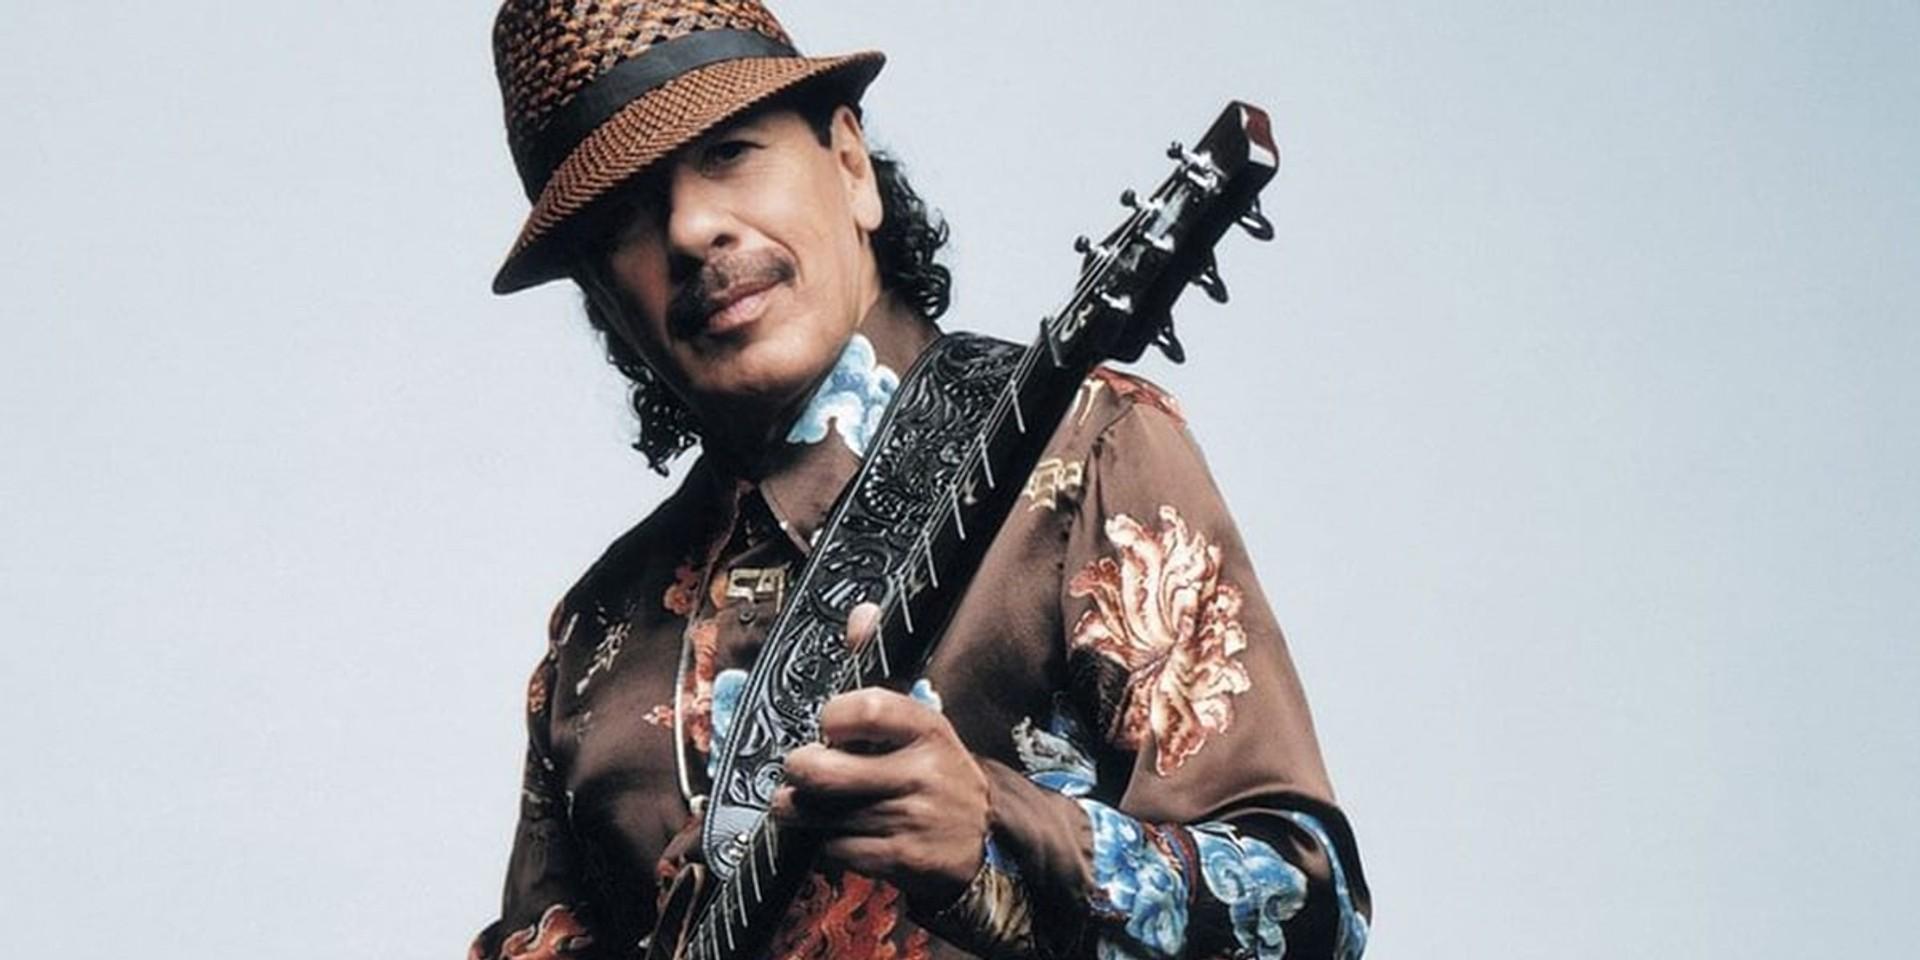 Hindsight 20/20: Latin guitar legend Santana reflects on his illustrious discography